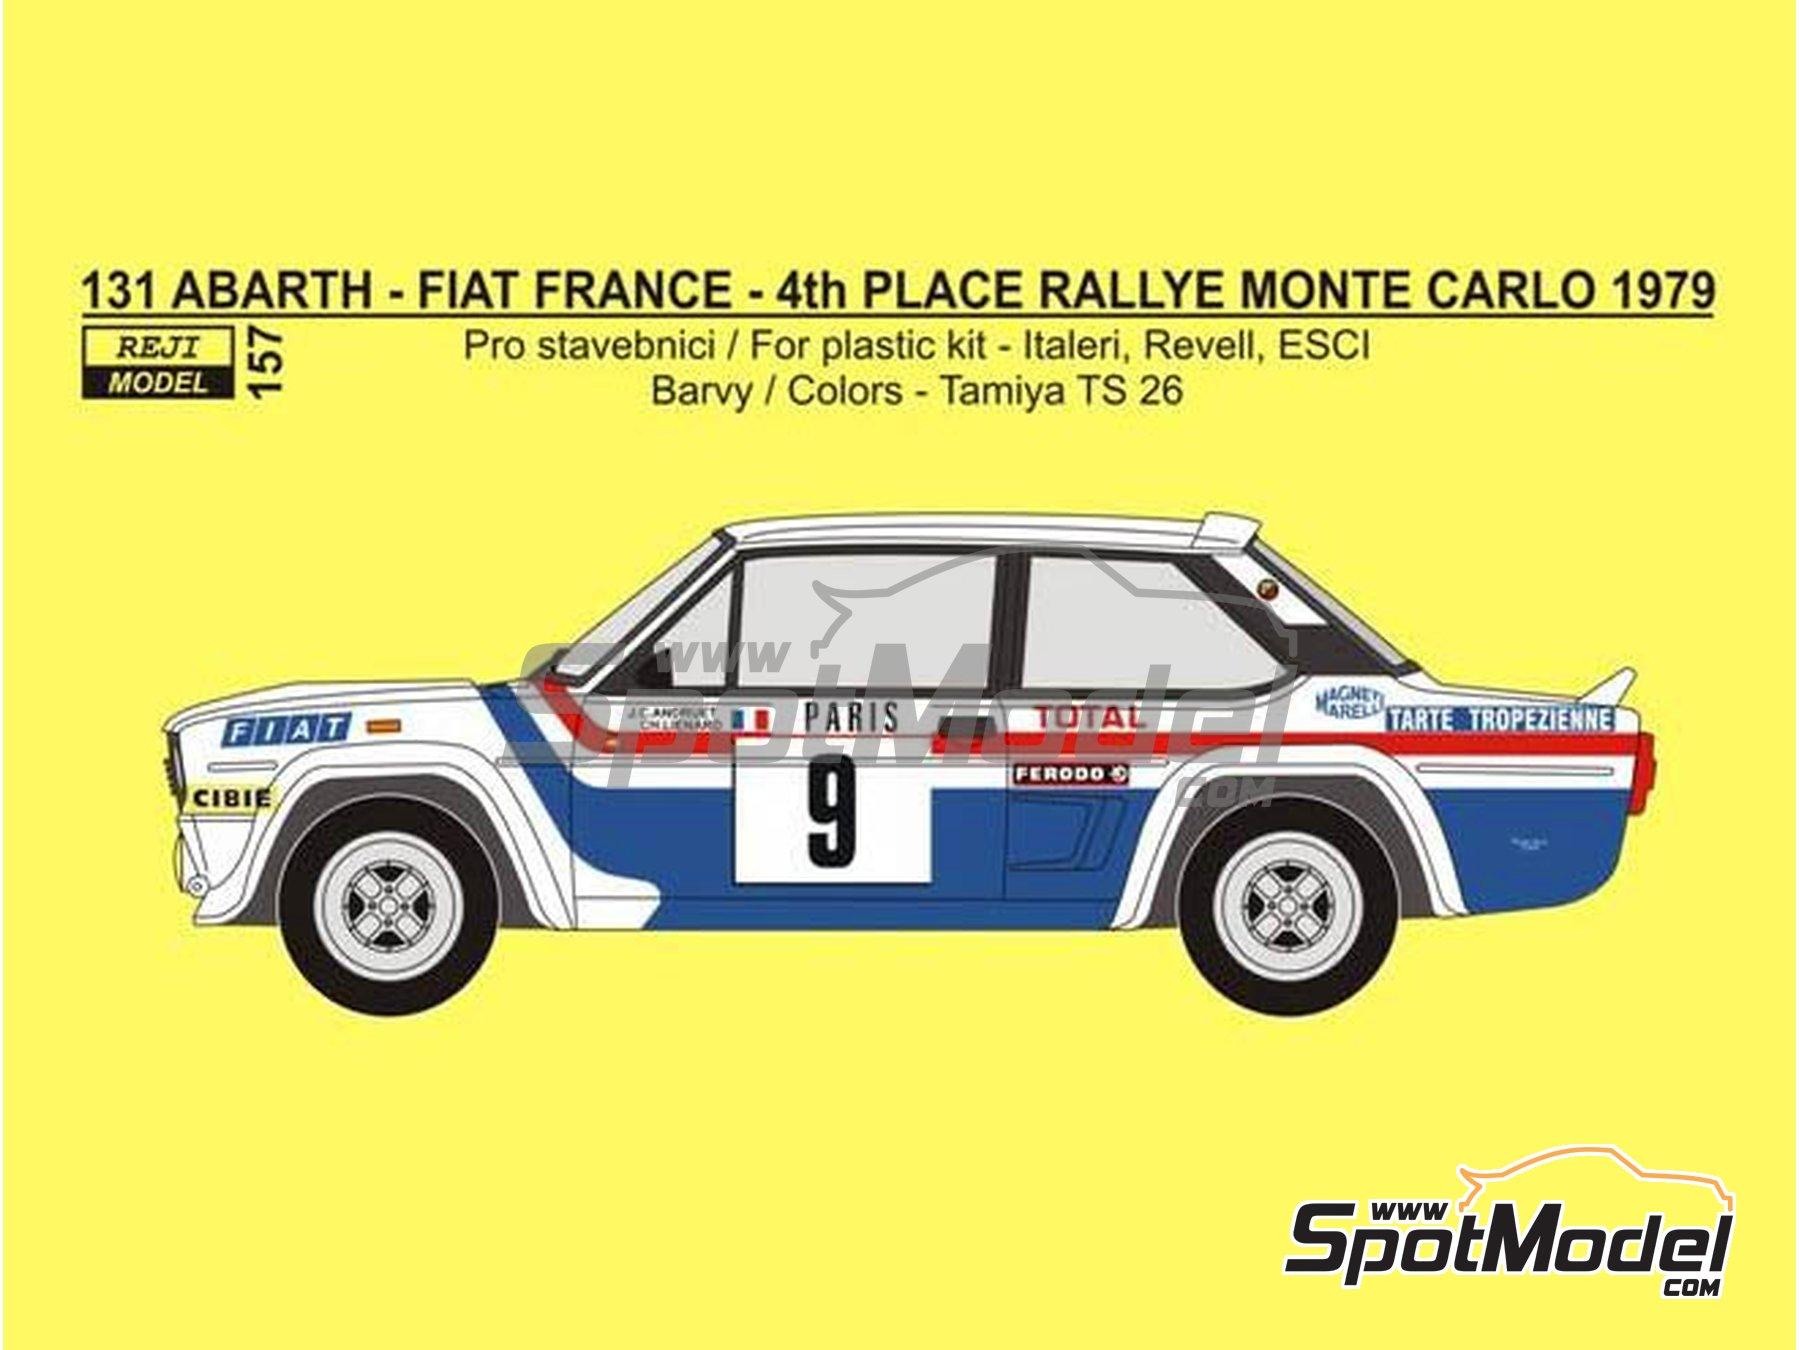 Image 1: Fiat 131 Abarth Fiat France - Montecarlo Rally - Rallye Automobile de Monte-Carlo 1979 | Marking / livery in 1/24 scale manufactured by Reji Model (ref.REJI-157)